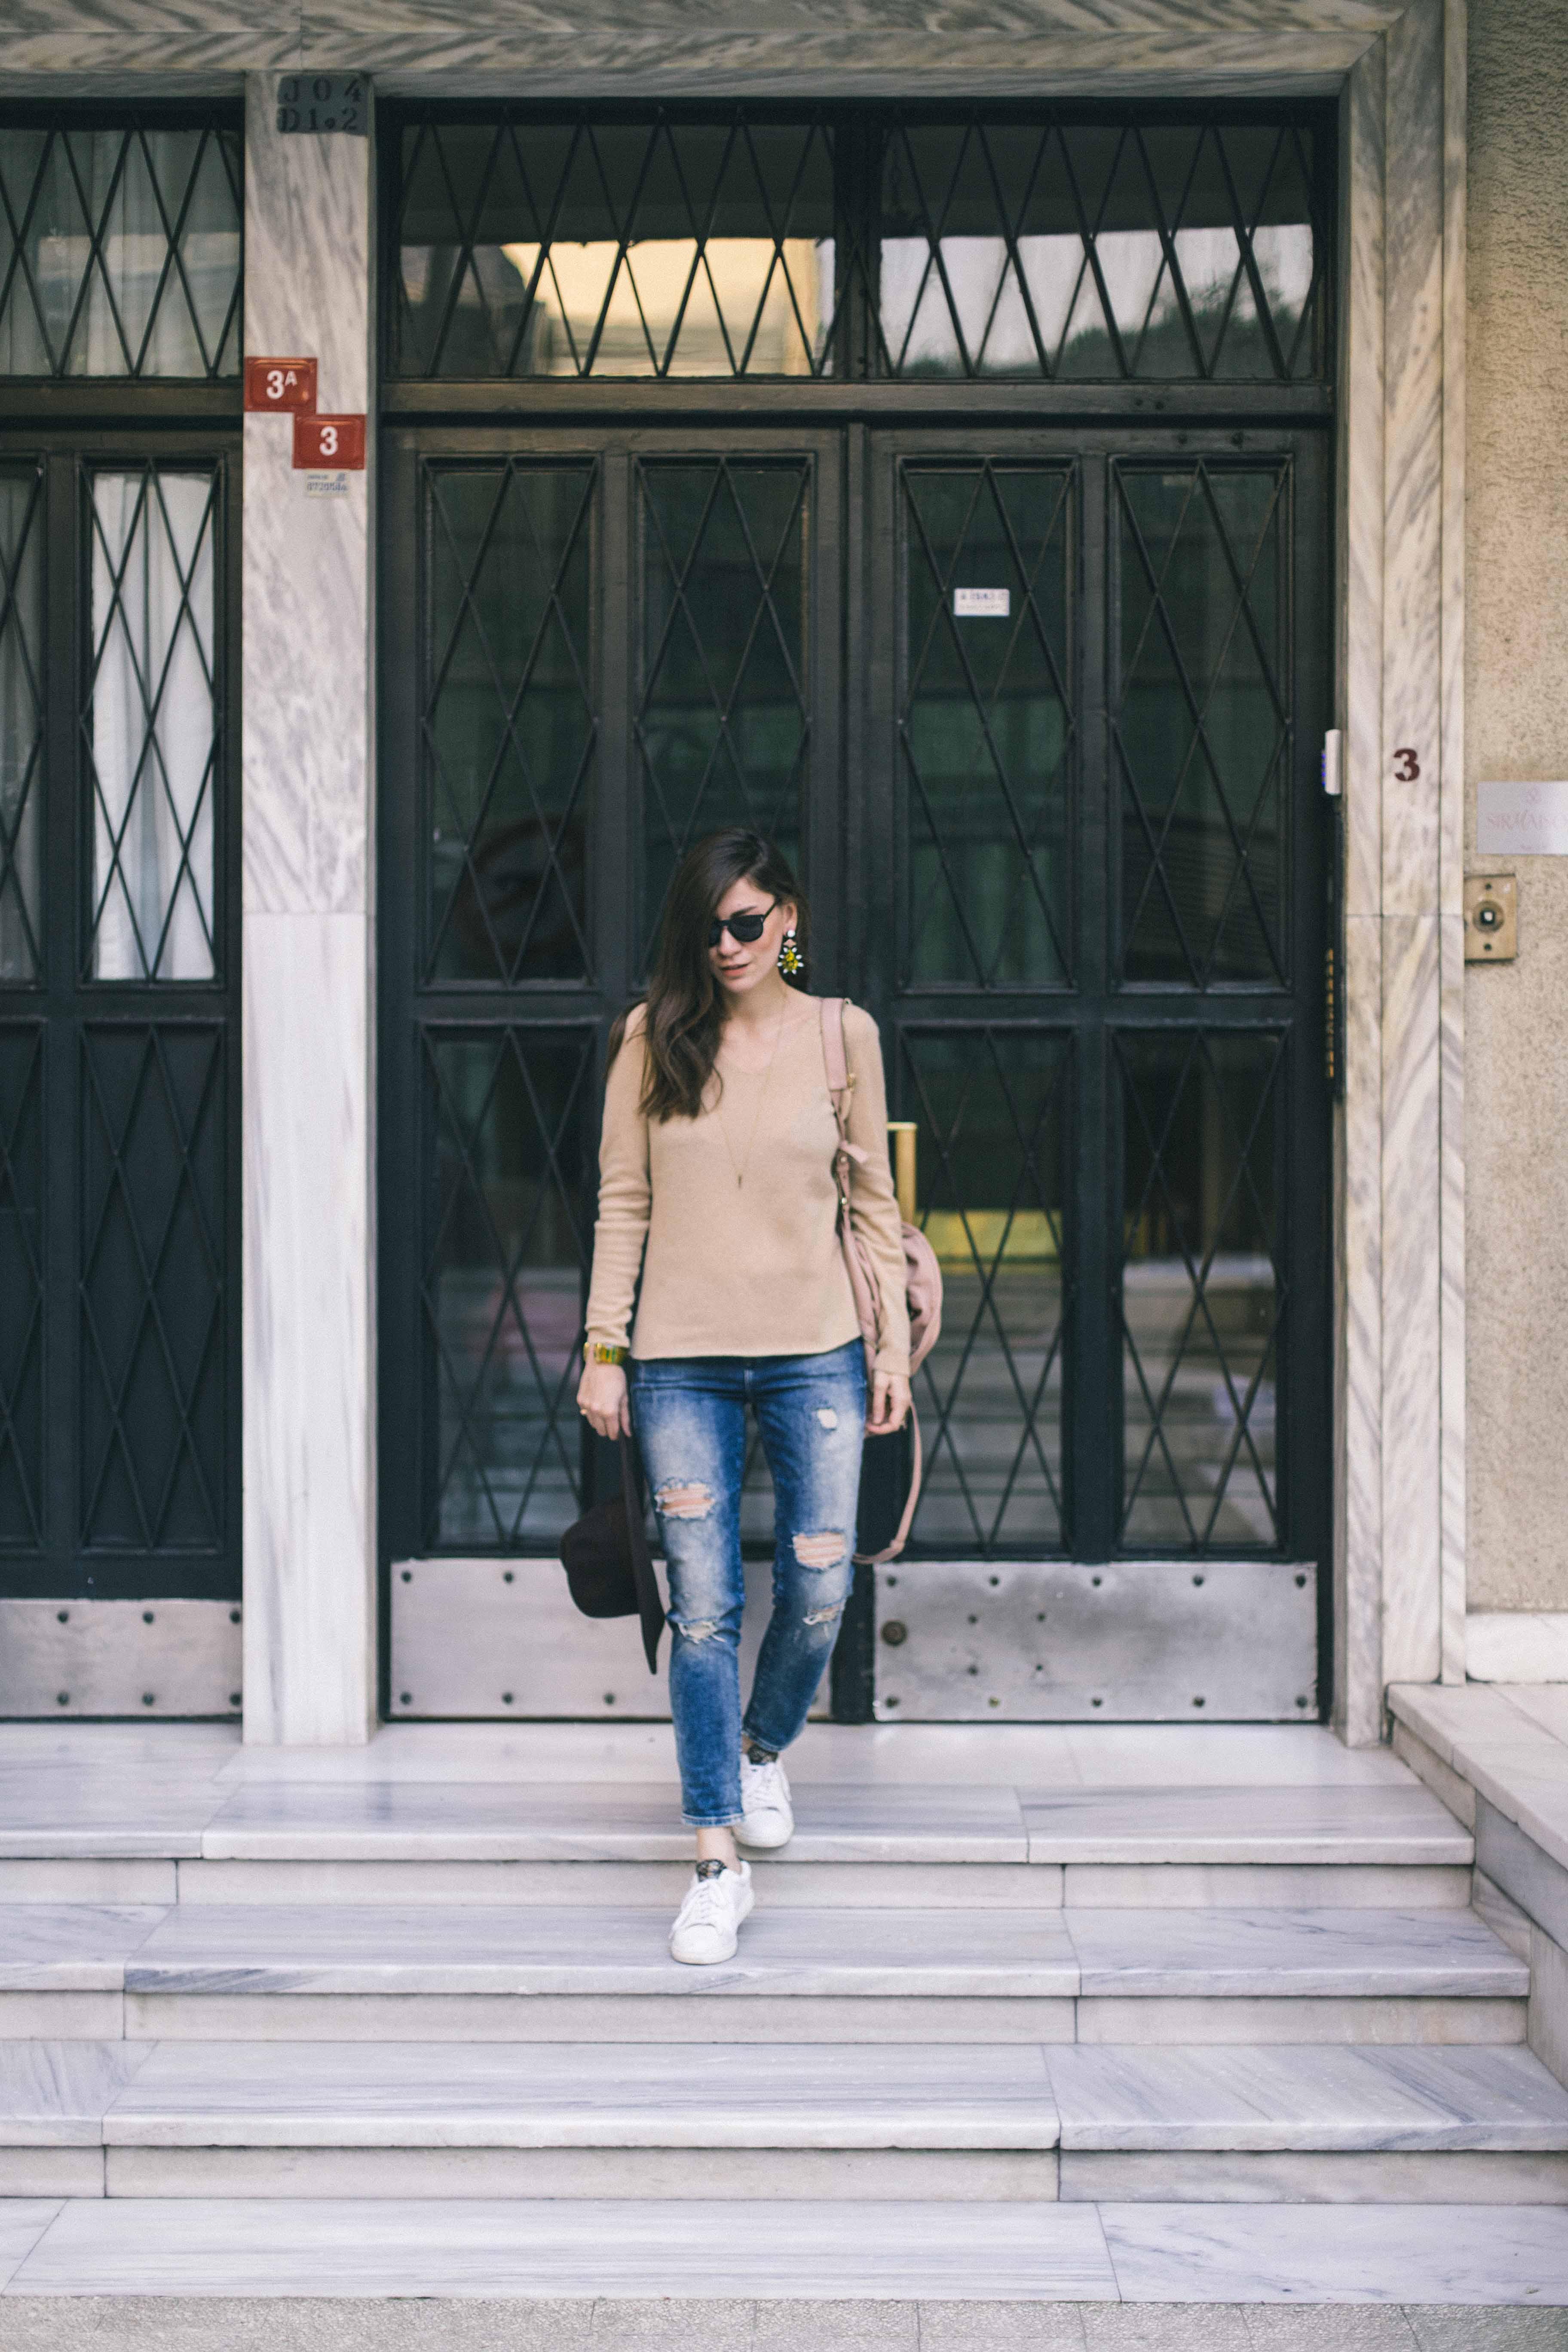 billur saatci, offnegiysem, turkish style blogger, street style, fashion, ootd, blogger, istanbul, mavi, ilovemavi, kaşmir, alexander wang, ada boyfriend jean, kaşmir kazak